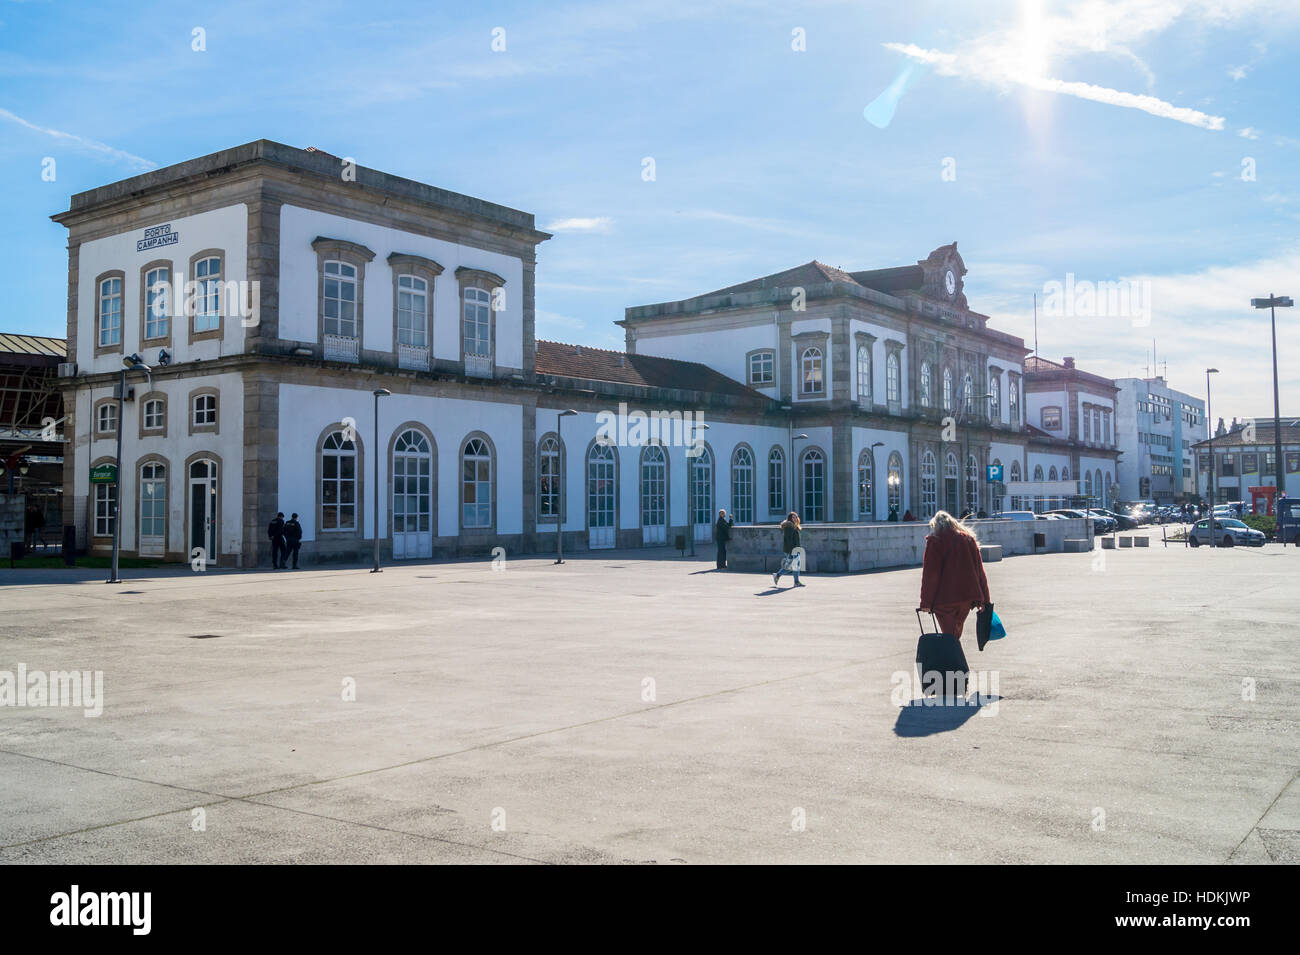 campanha-comboios-de-portugal-railway-station-1875-porto-oporto-portugal-HDKJWP.jpg